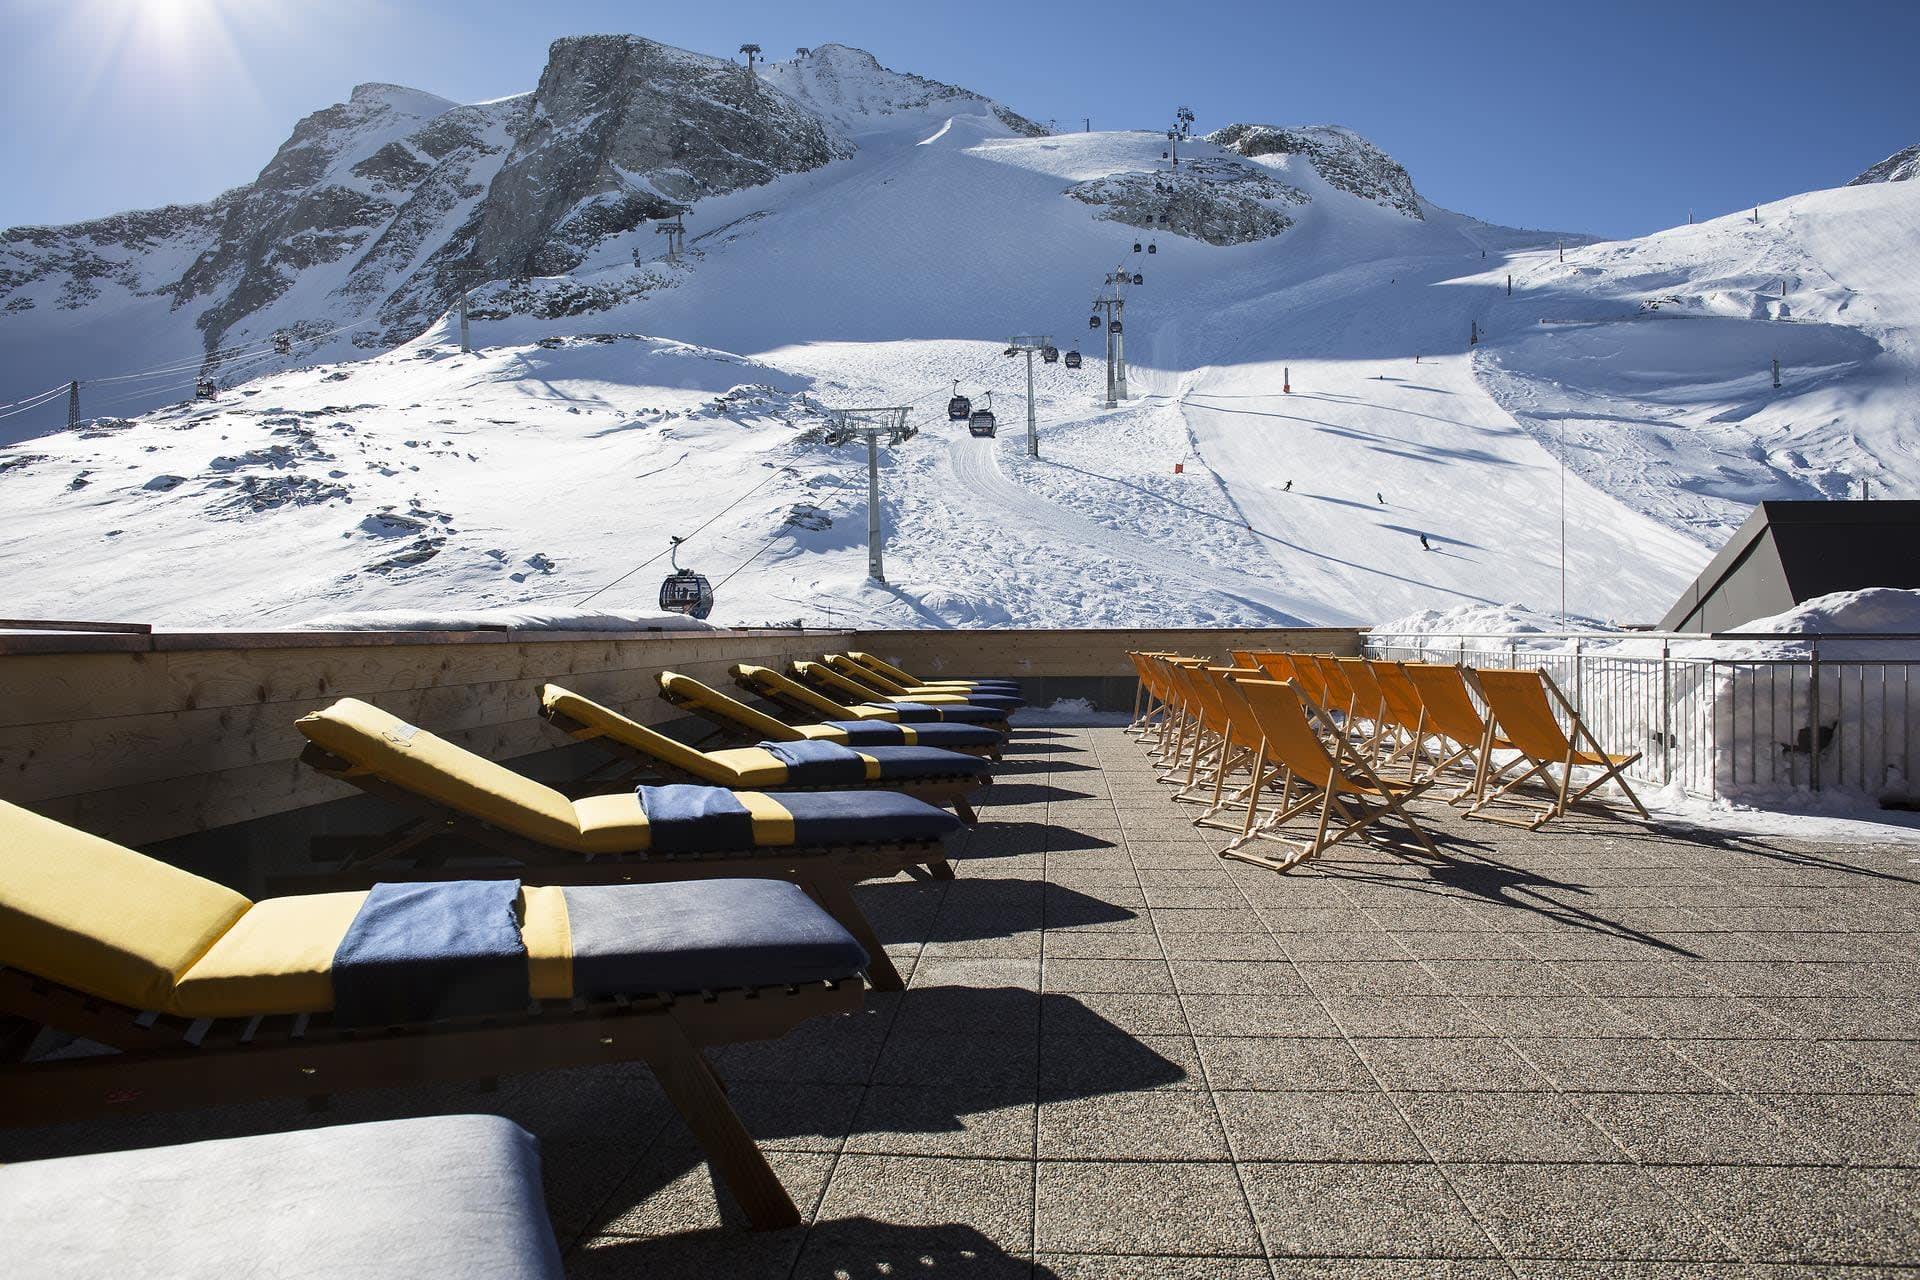 Sonnenterrasse Fernerhaus am Hintertuxer Gletscher